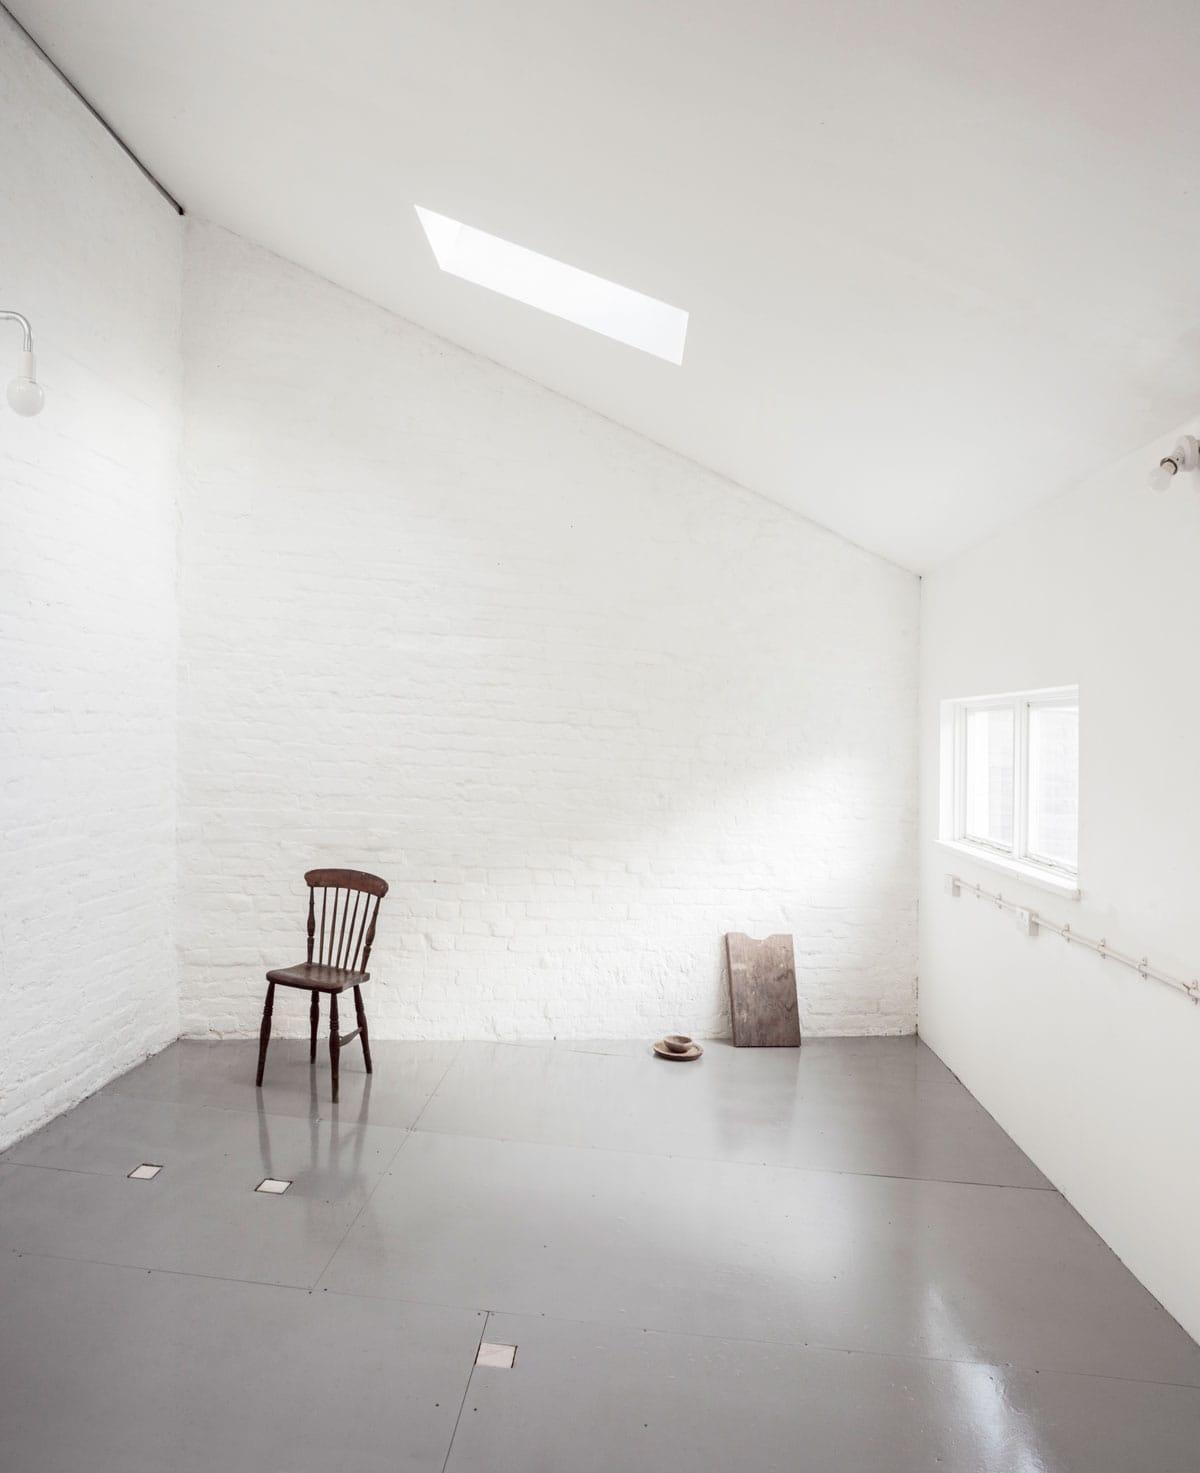 Newly designed artists studios by EBBA at Flat Time House photo: Lorenzo Zandri  (FLAT TIME HOUSE OPEN WEEKEND 3)